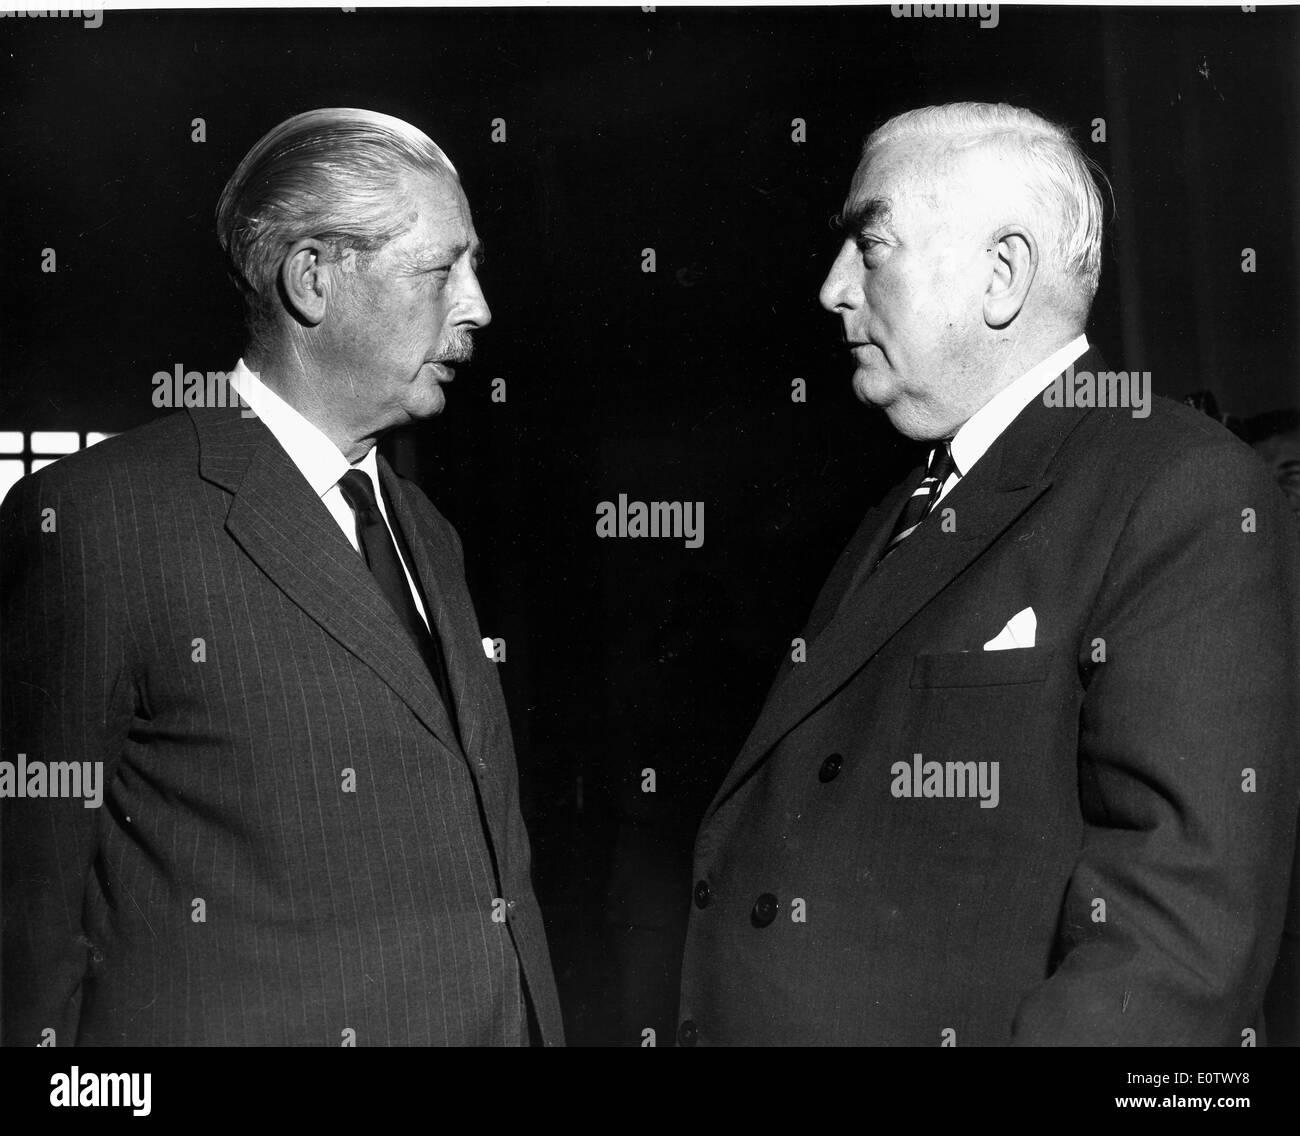 Harold Macmillan talks with Robert Menzies at UN - Stock Image